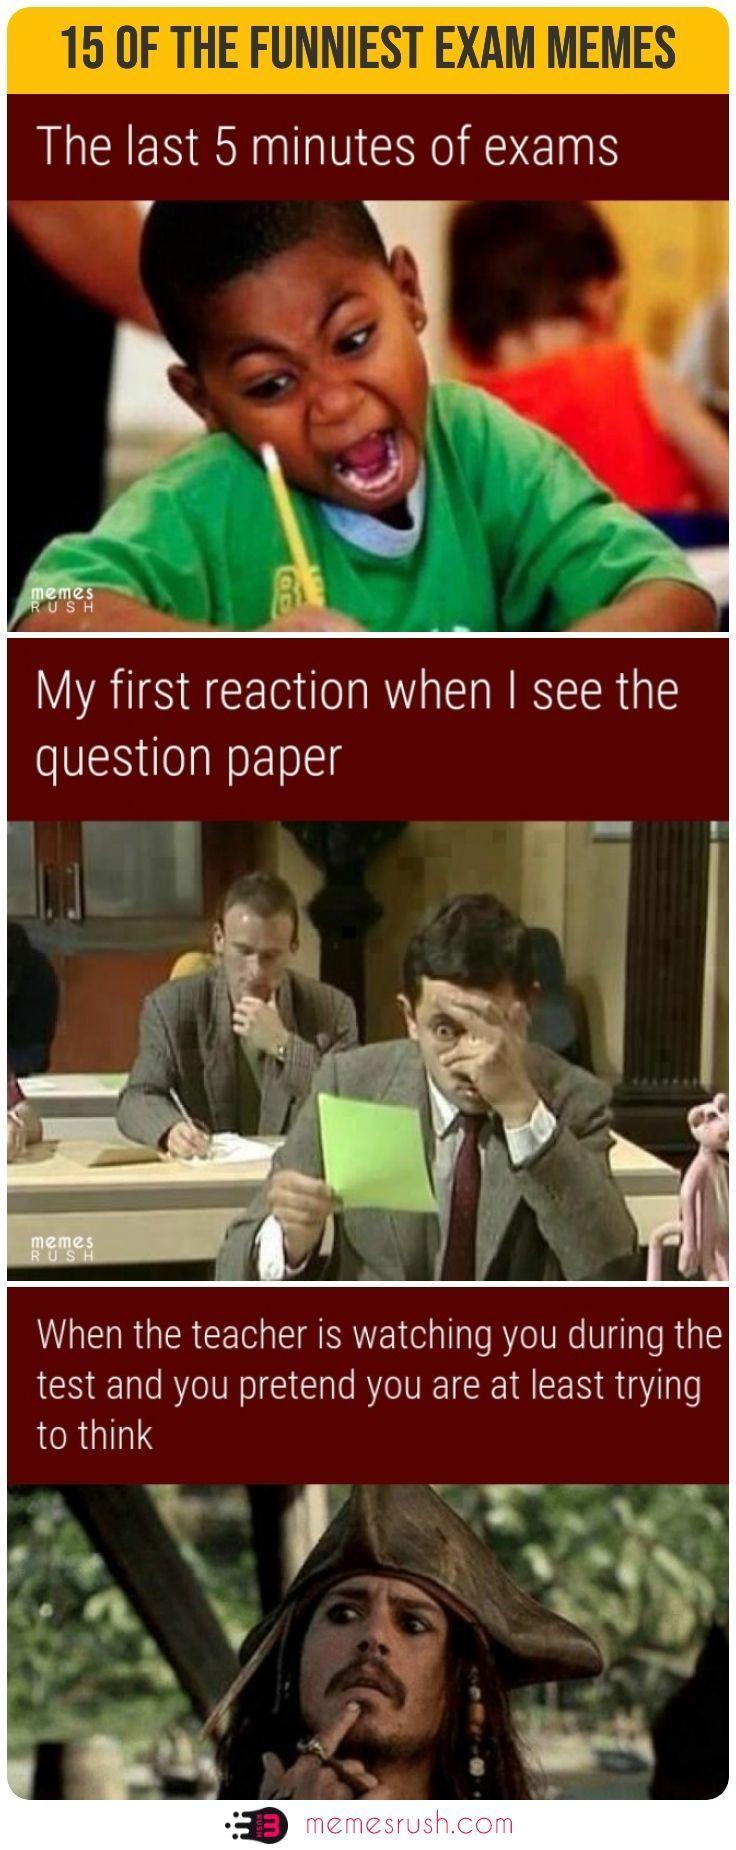 15 Of The Funniest Exam Memes Exams Memes Funny School Memes Exams Funny